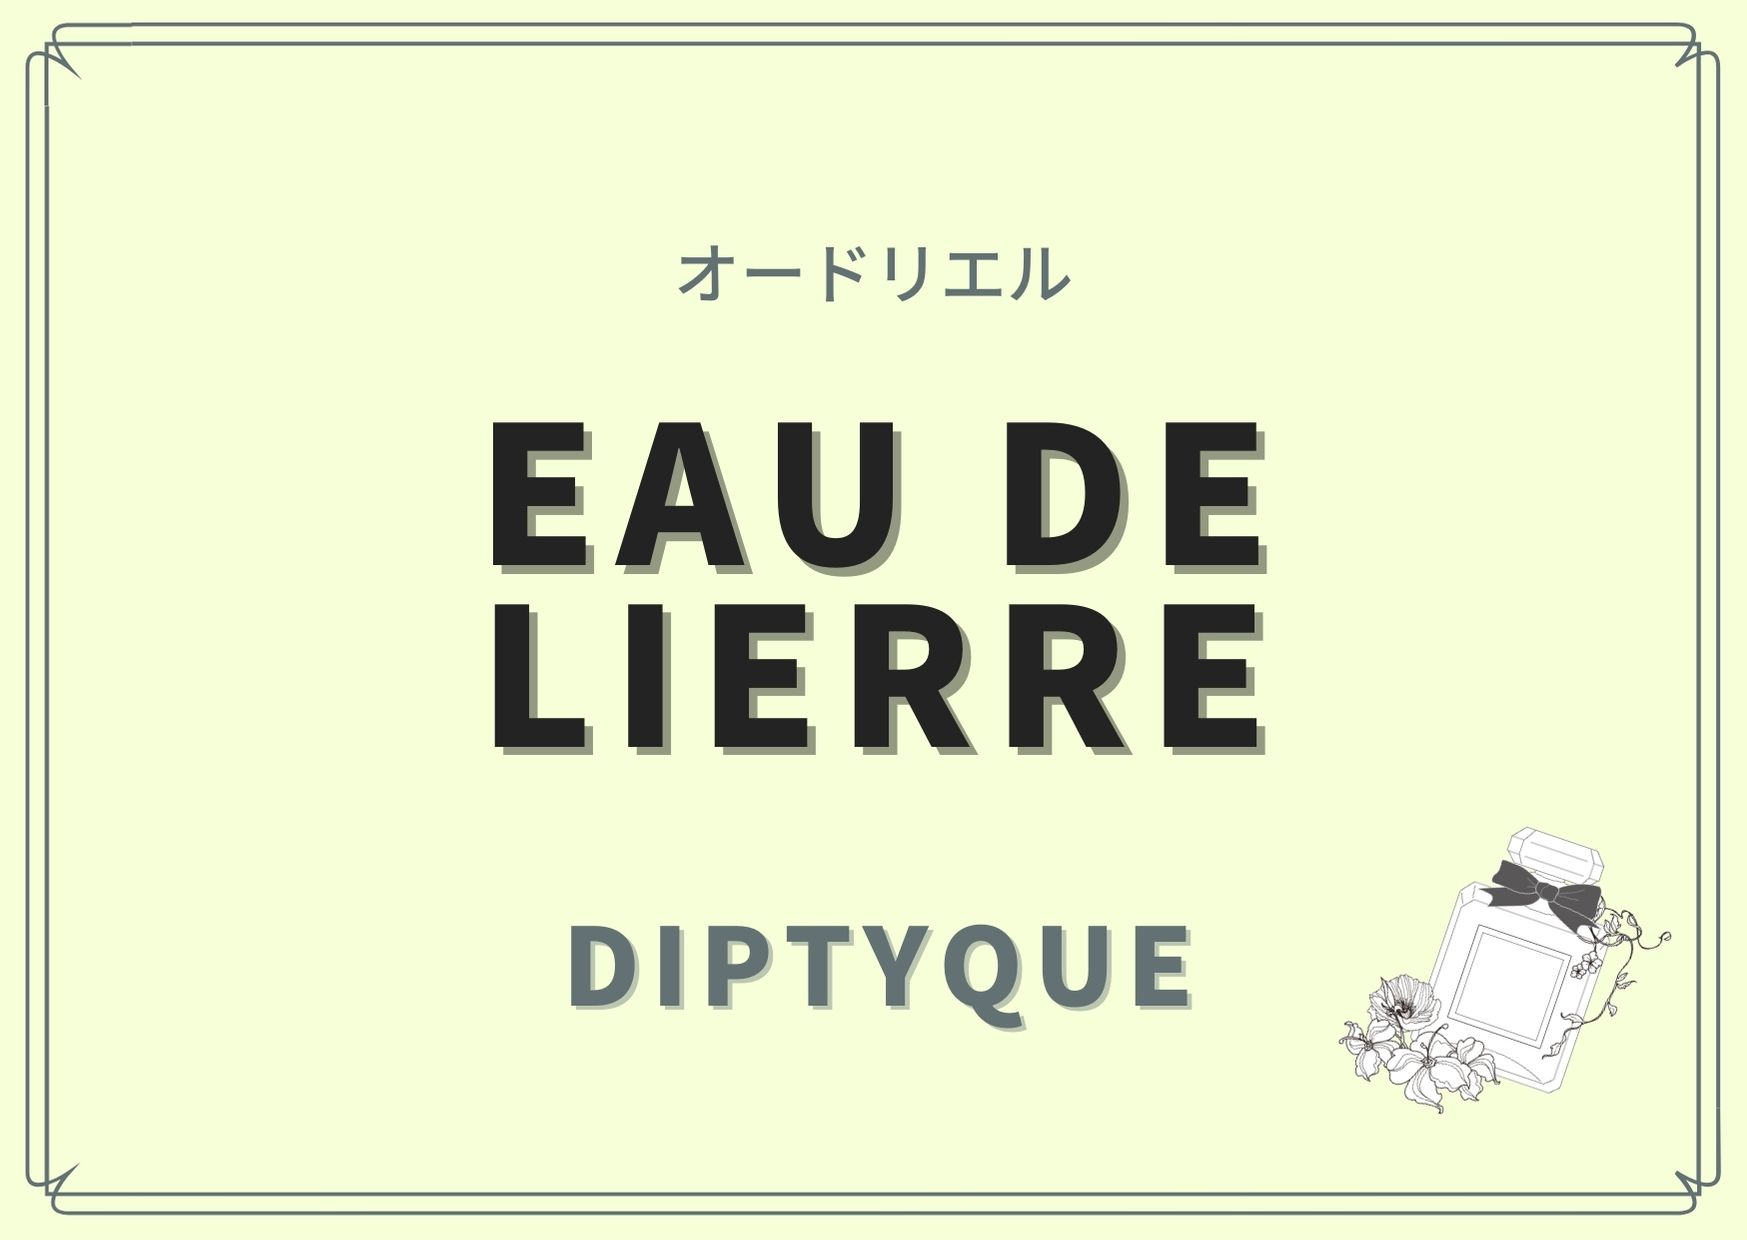 EAU DE LIERRE(オードリエル) / DIPTYQUE(ディプティック)